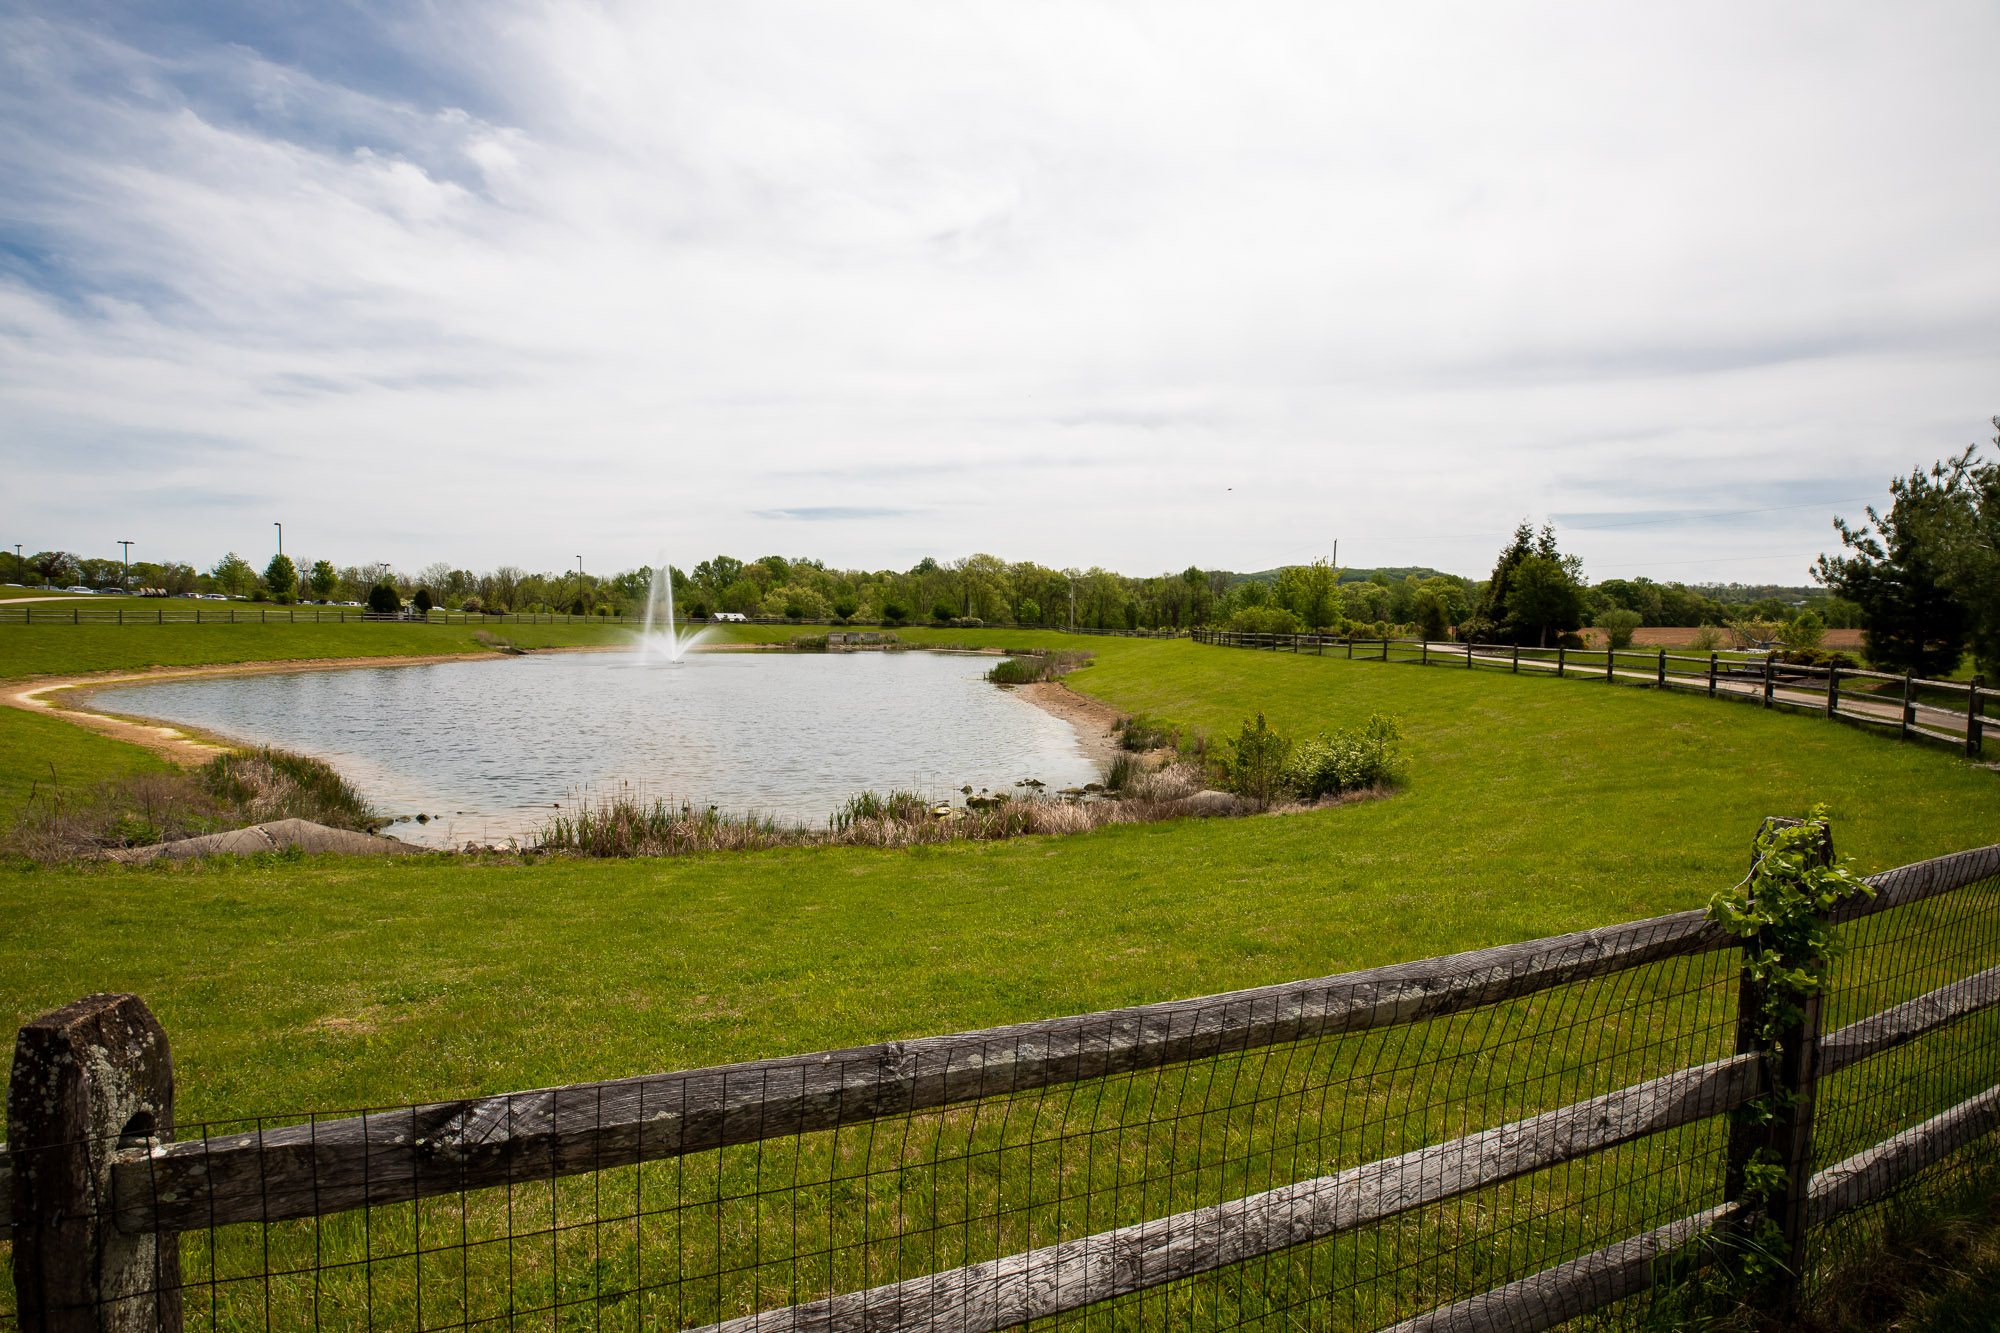 St. Lukes Spray Irrigation